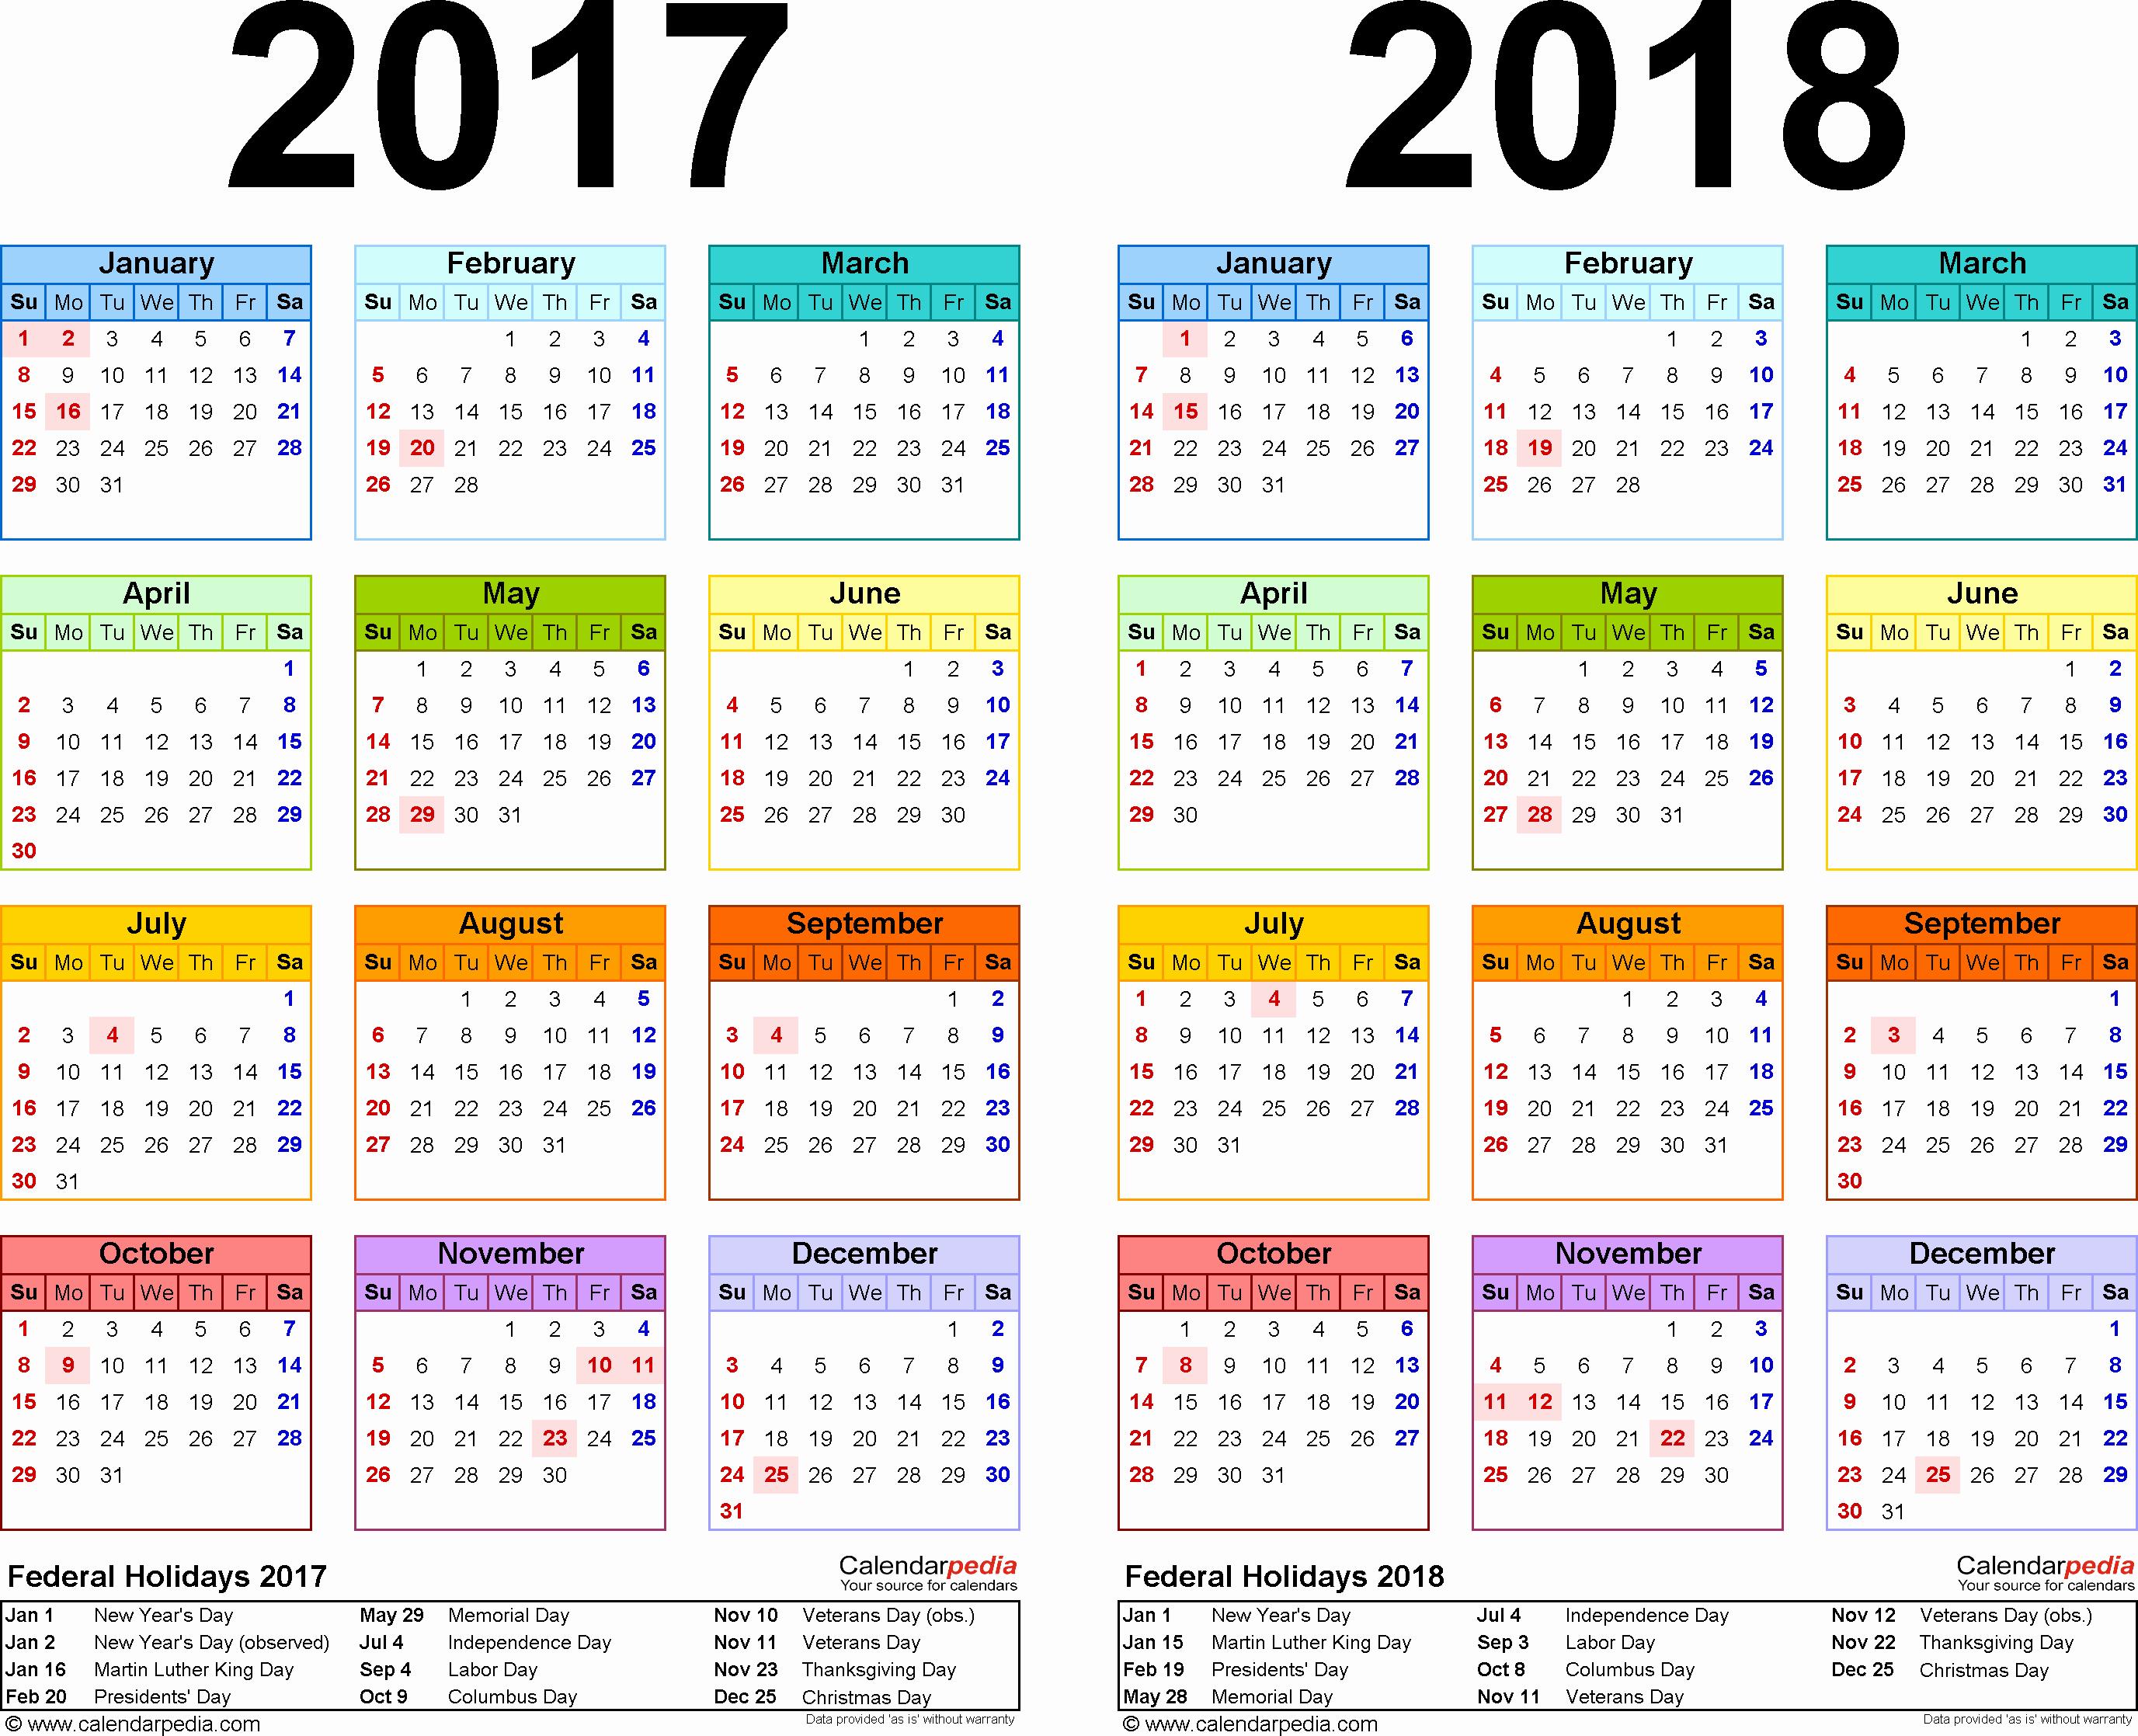 Calendar 2018 Printable with Holidays Elegant May 2018 Calendar Word